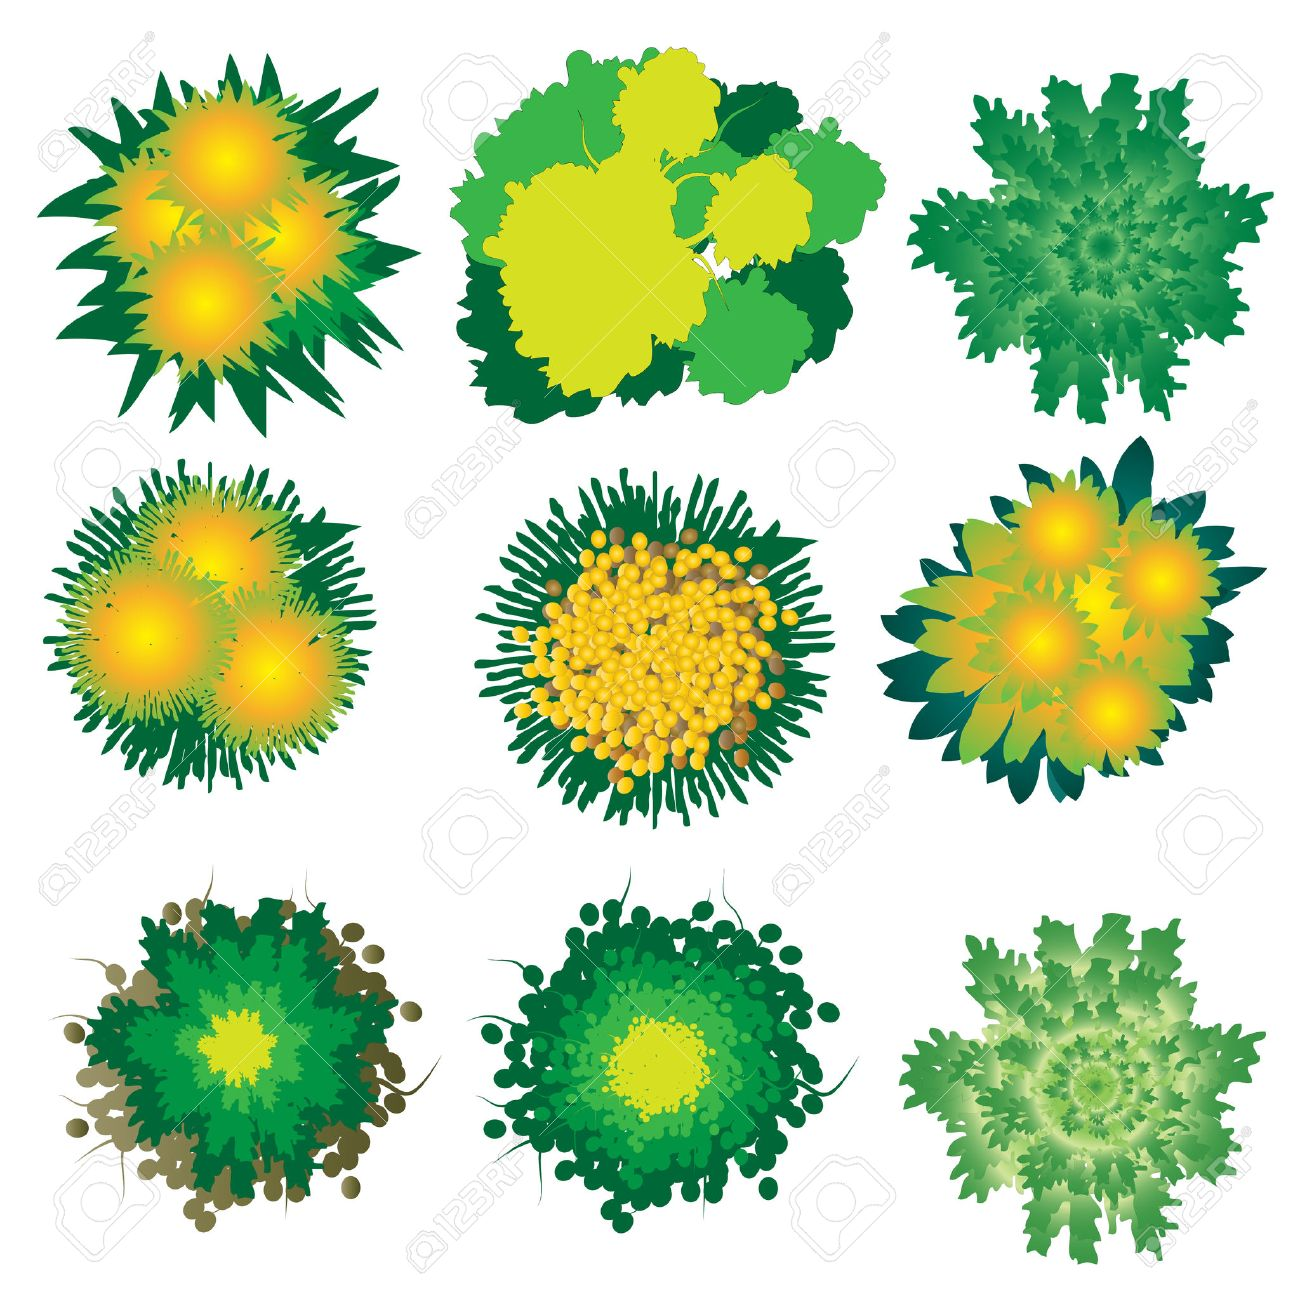 Plants and Trees top view set 4 for Landscape design , vector illustration - 48756163